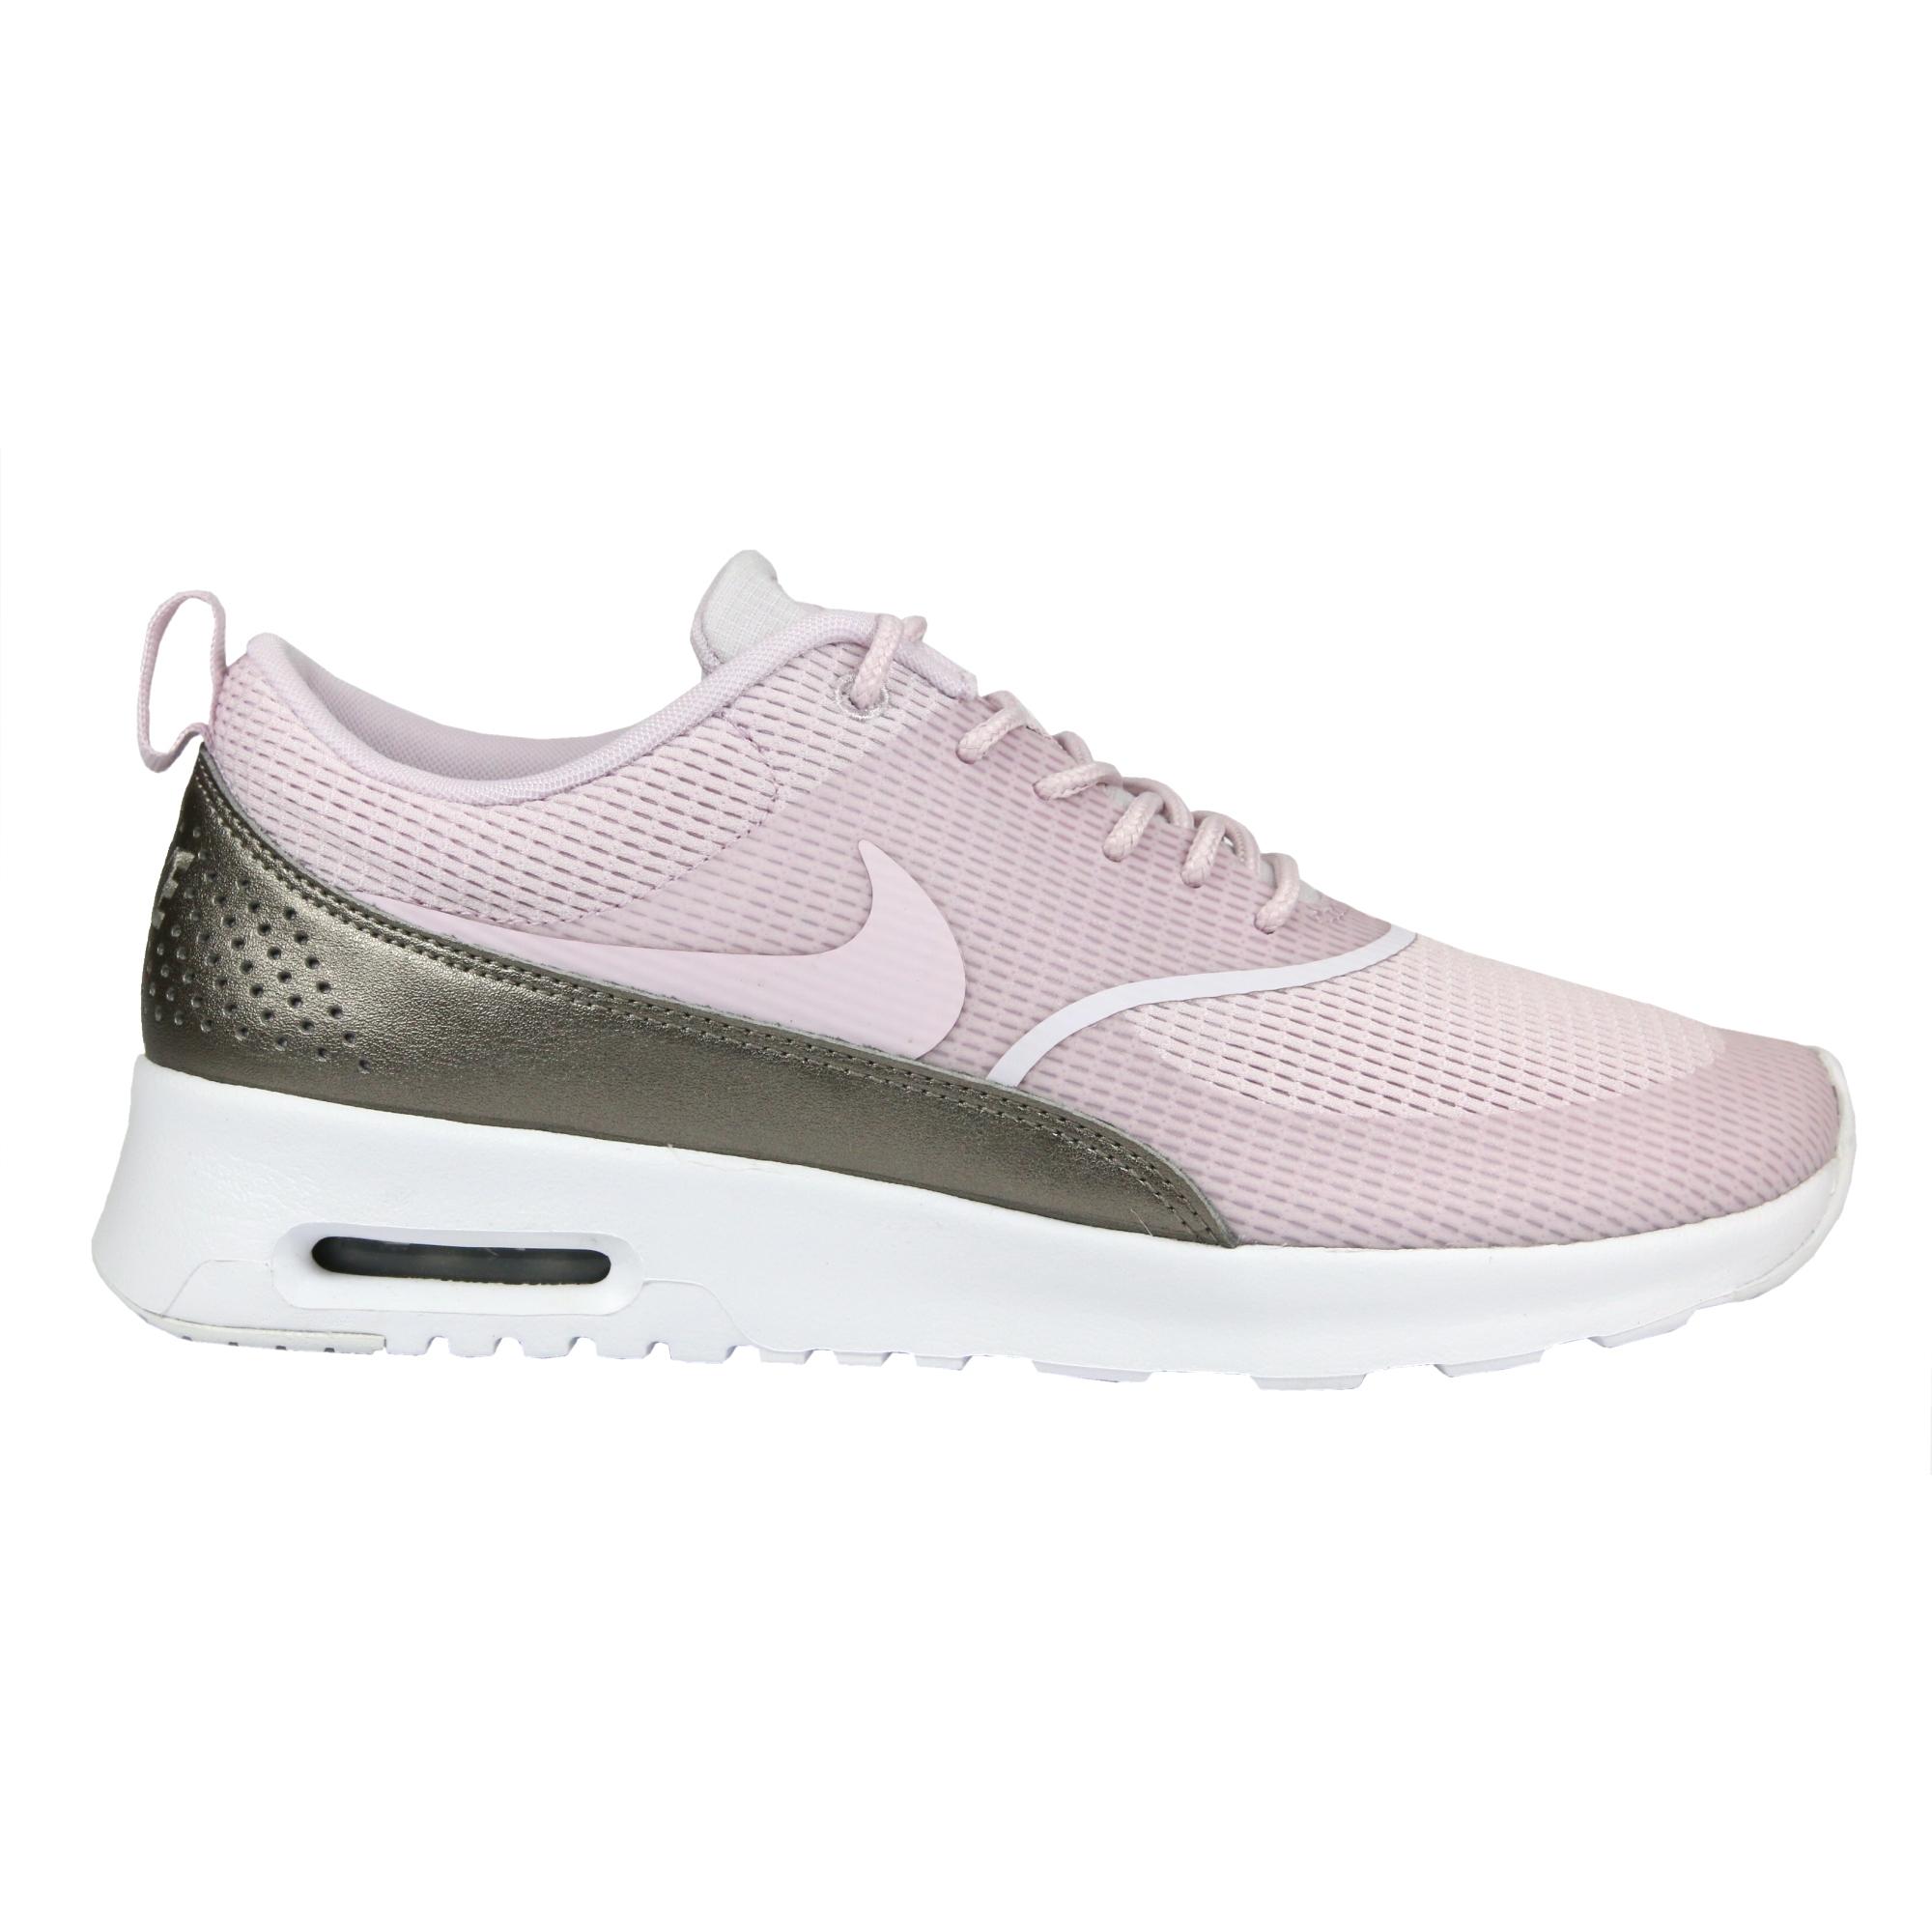 nike air max thea schuhe turnschuhe sneaker damen pink. Black Bedroom Furniture Sets. Home Design Ideas